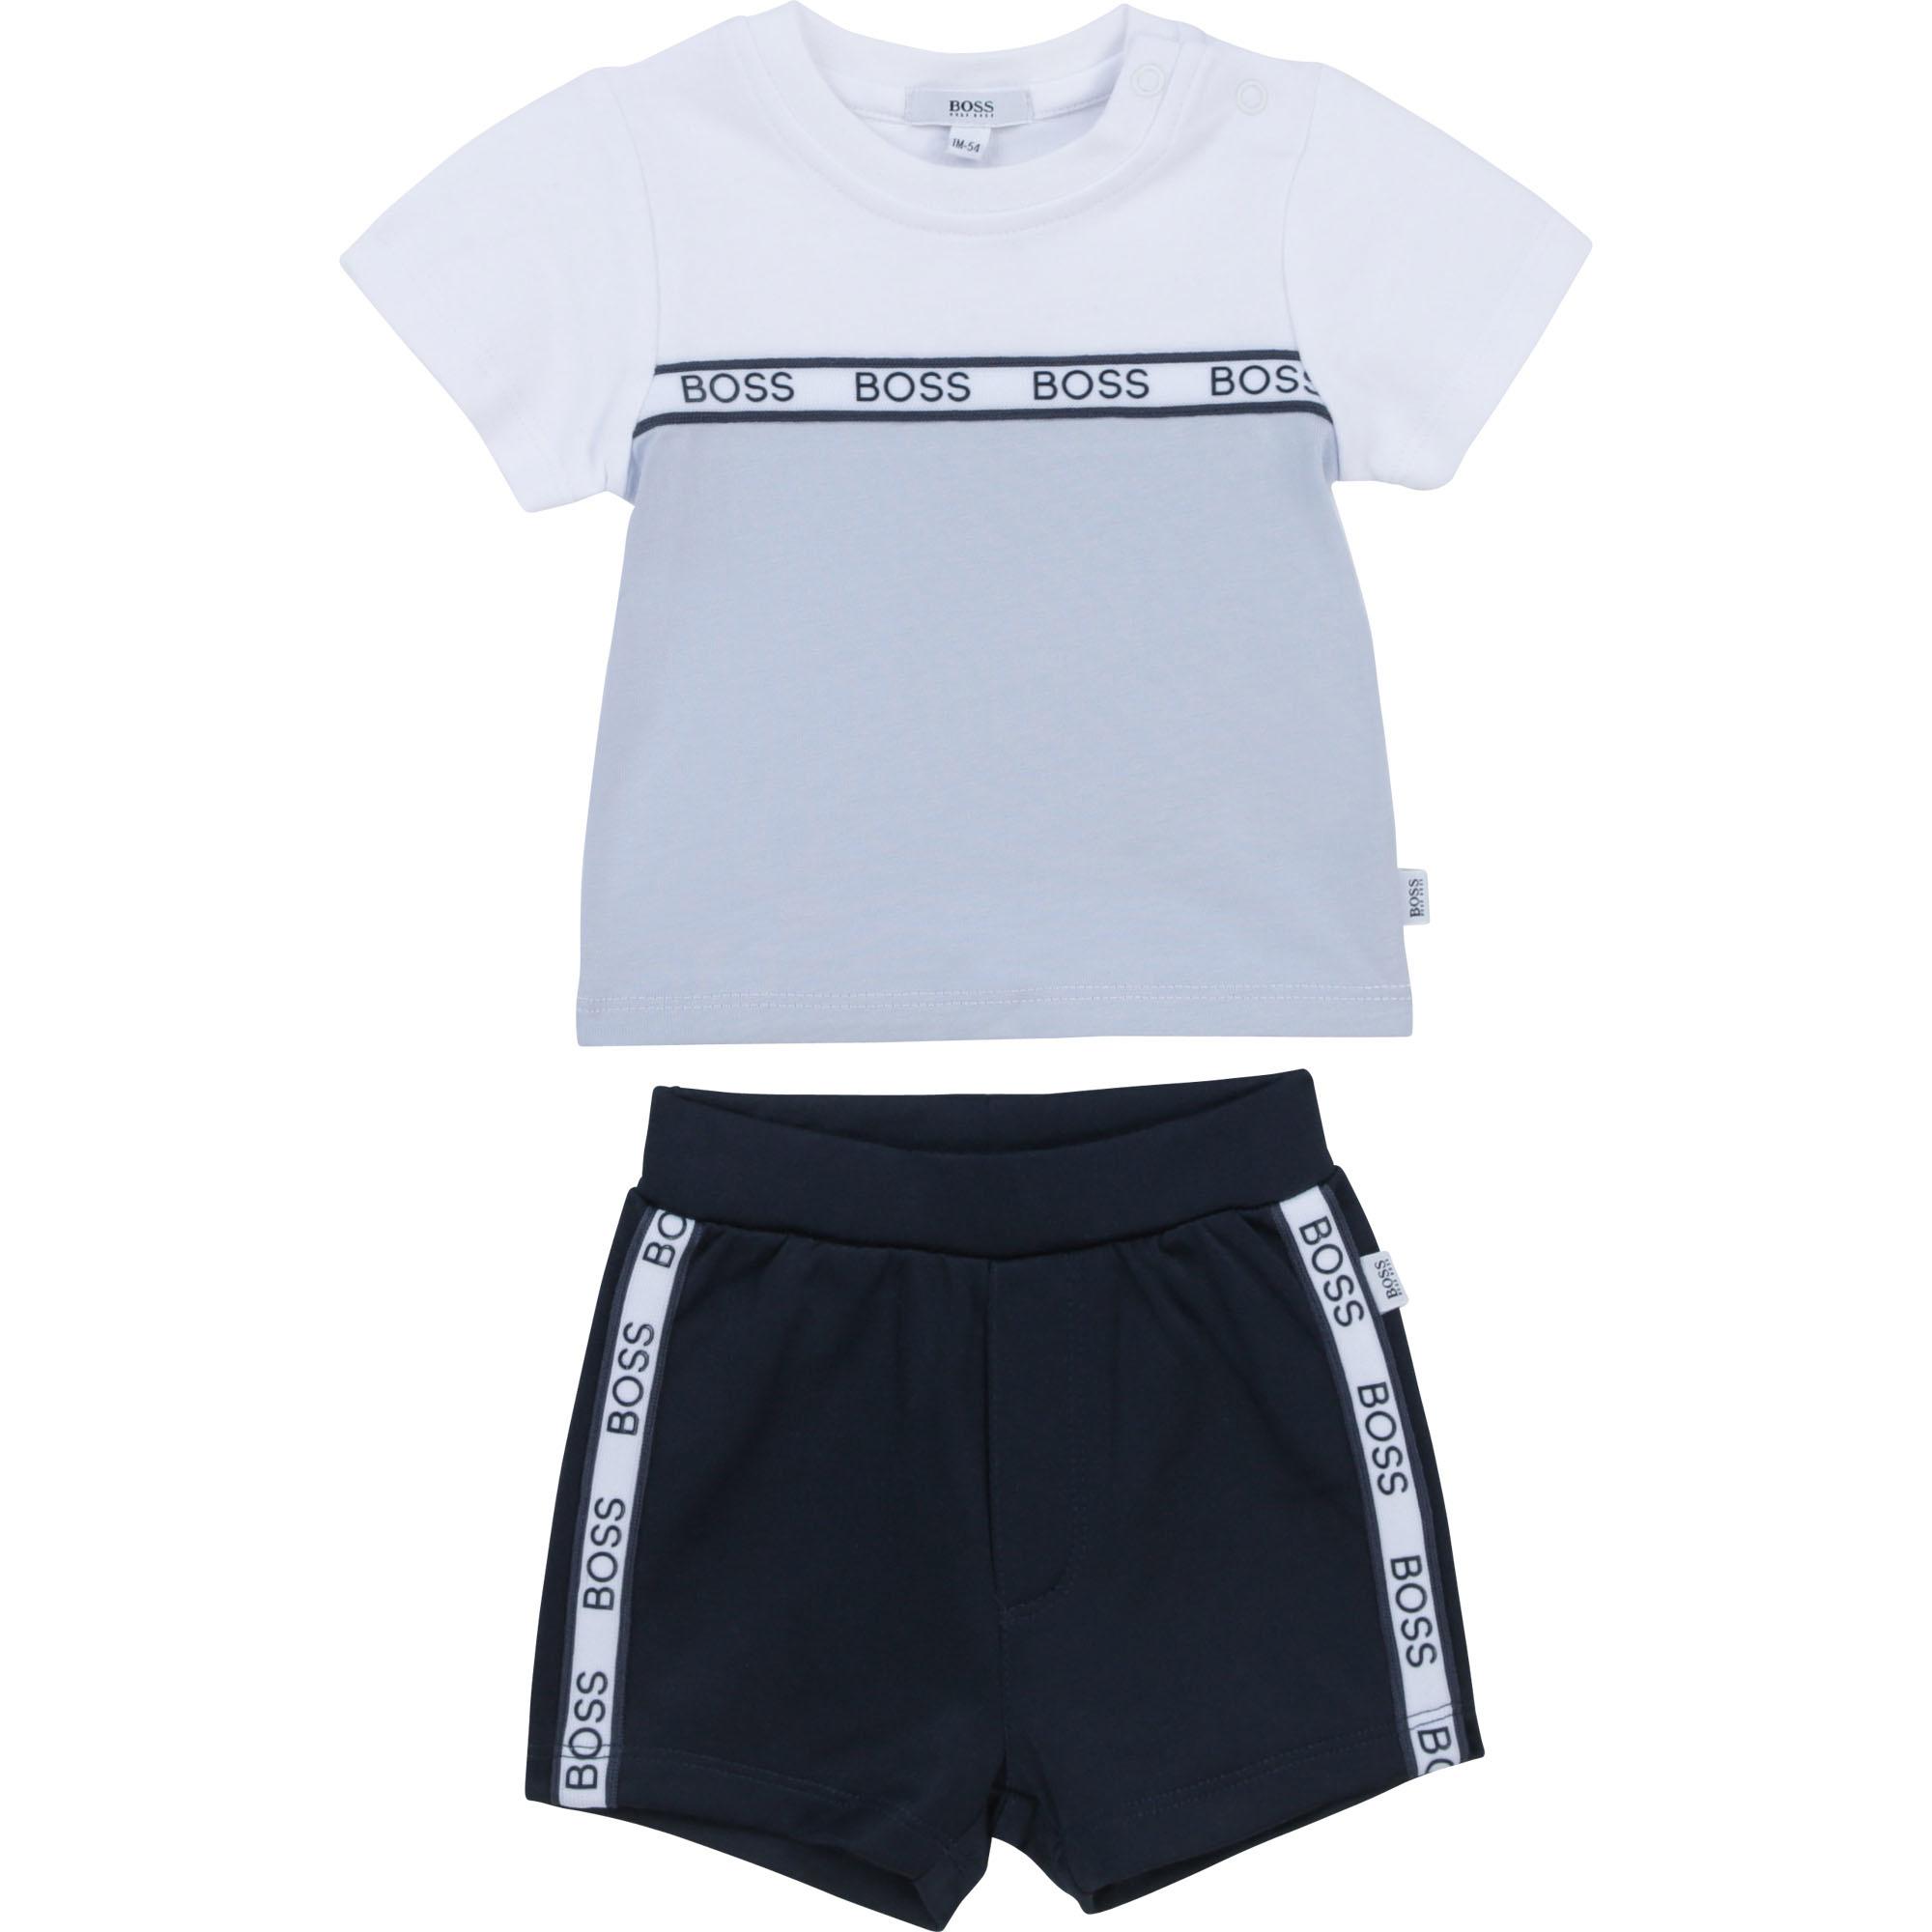 BOSS ensemble t-shirt et bermuda-1